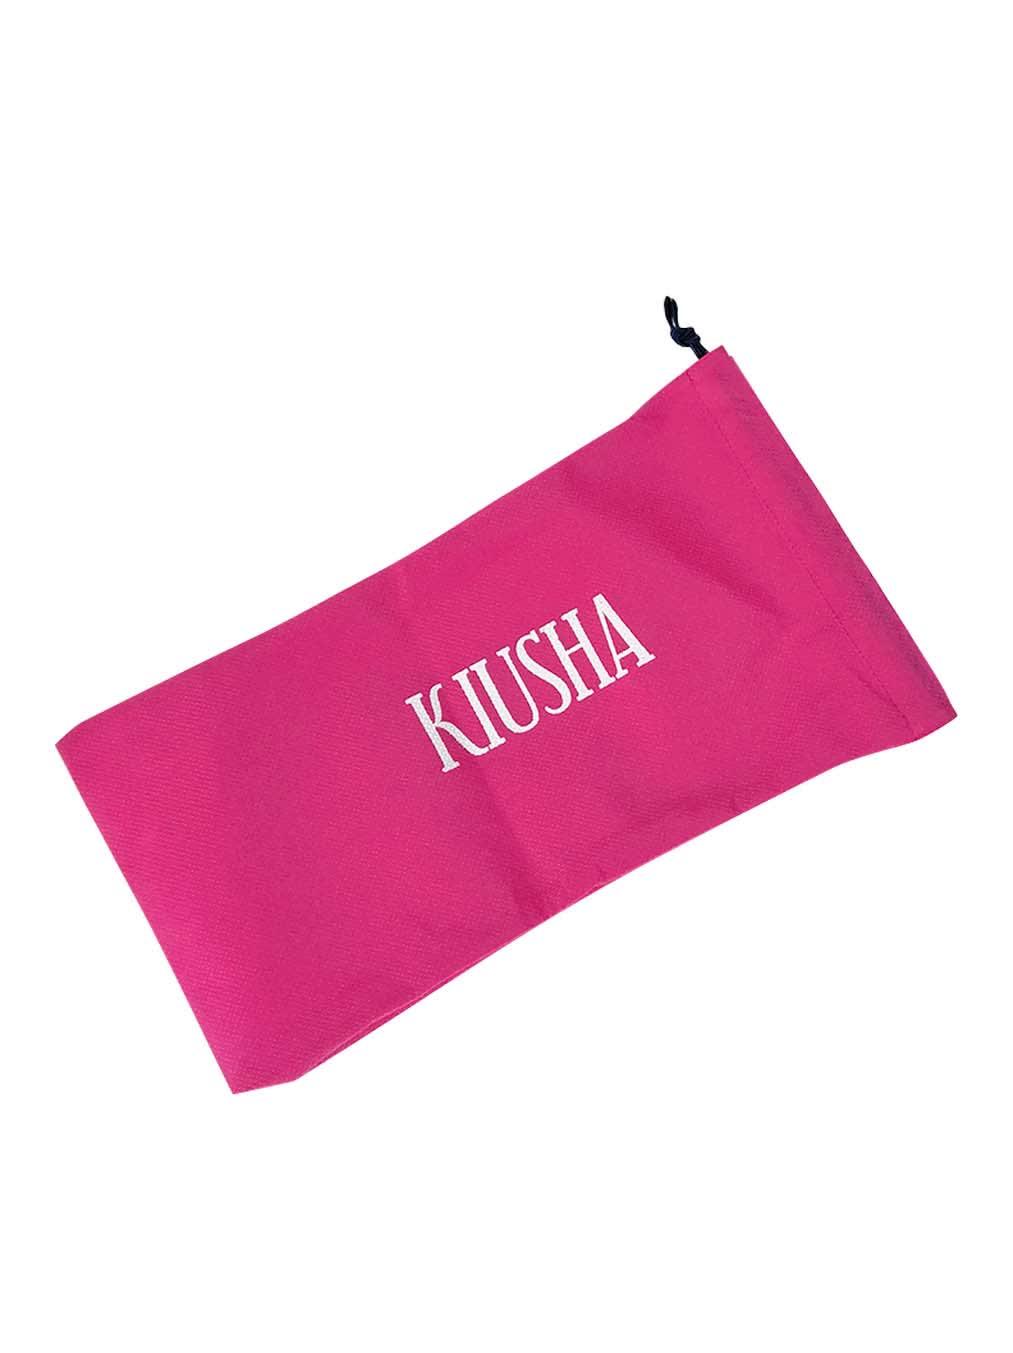 bolsas de tela para emprendedores